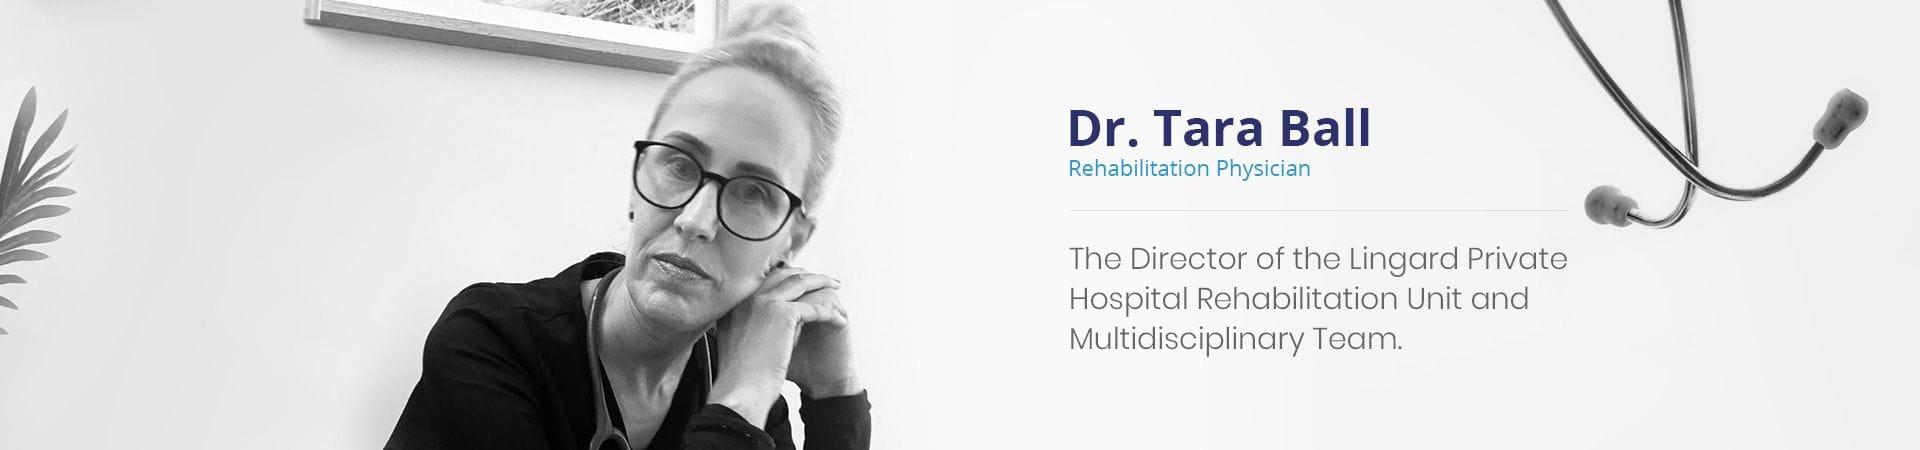 Specialist Rehab | Dr Tara Ball | Rehabilitation Physician